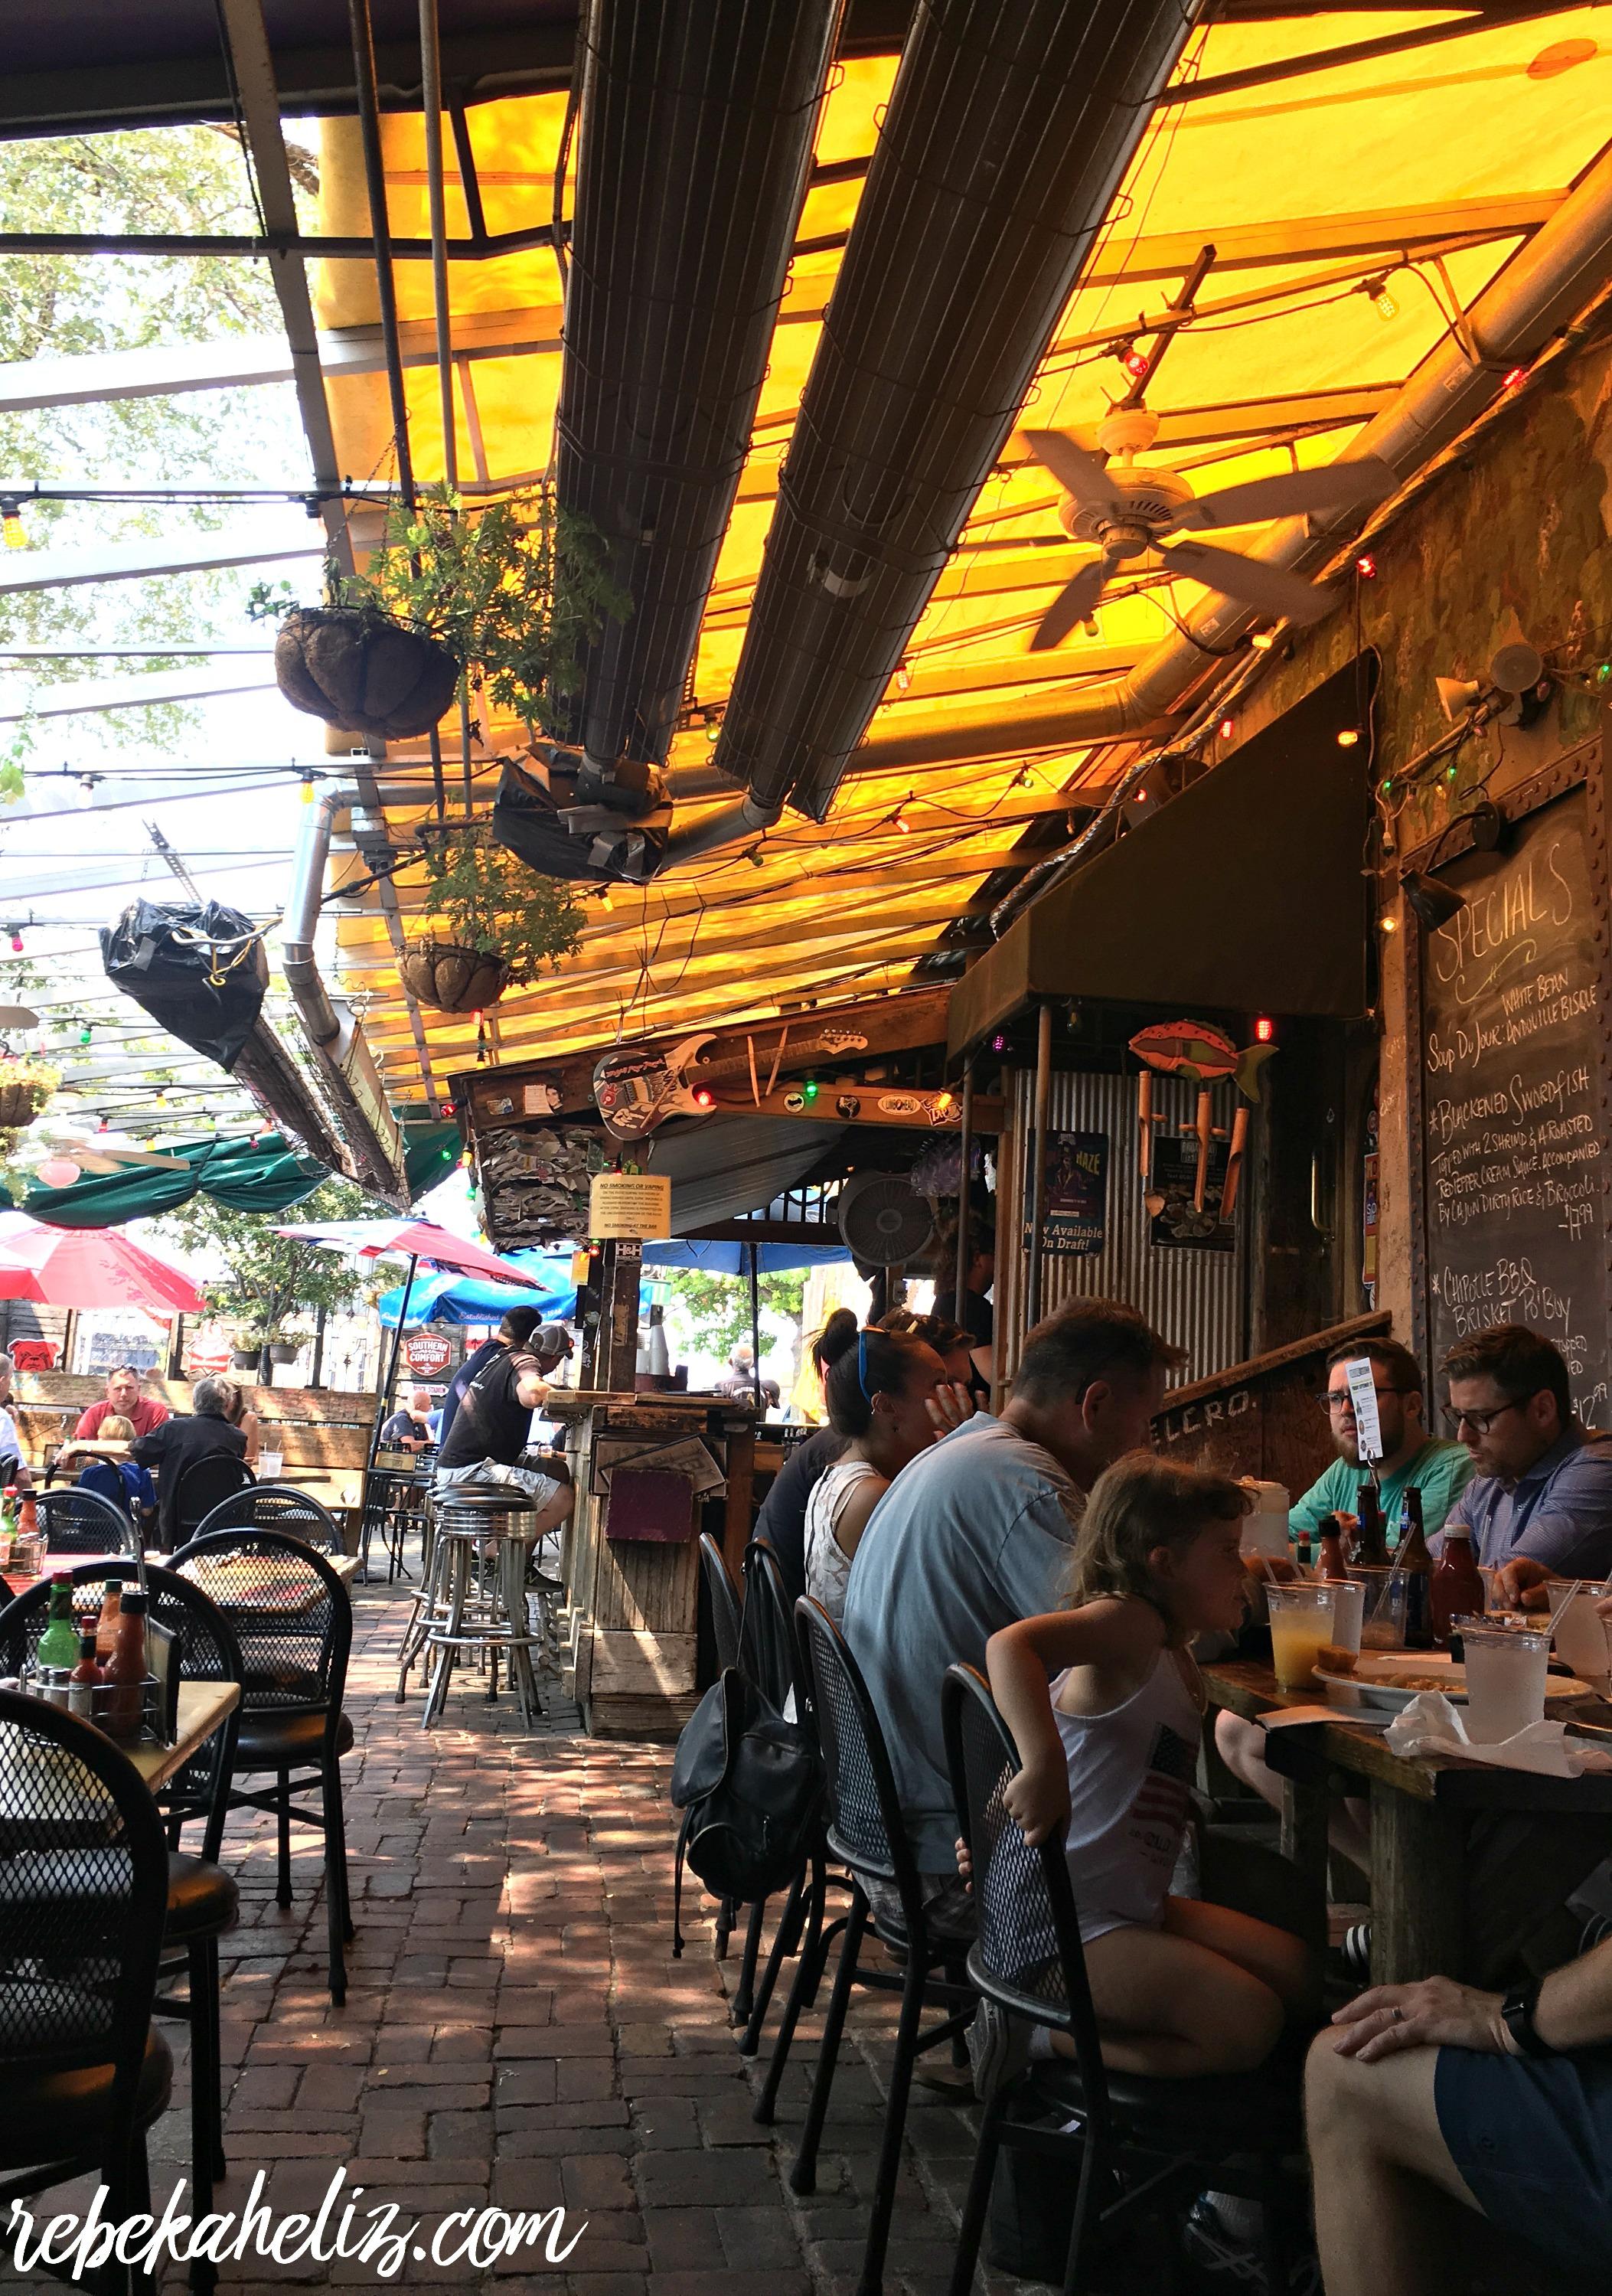 st. louis, restaurants, travel, seafood, broadway oyster bar, st. louis eats